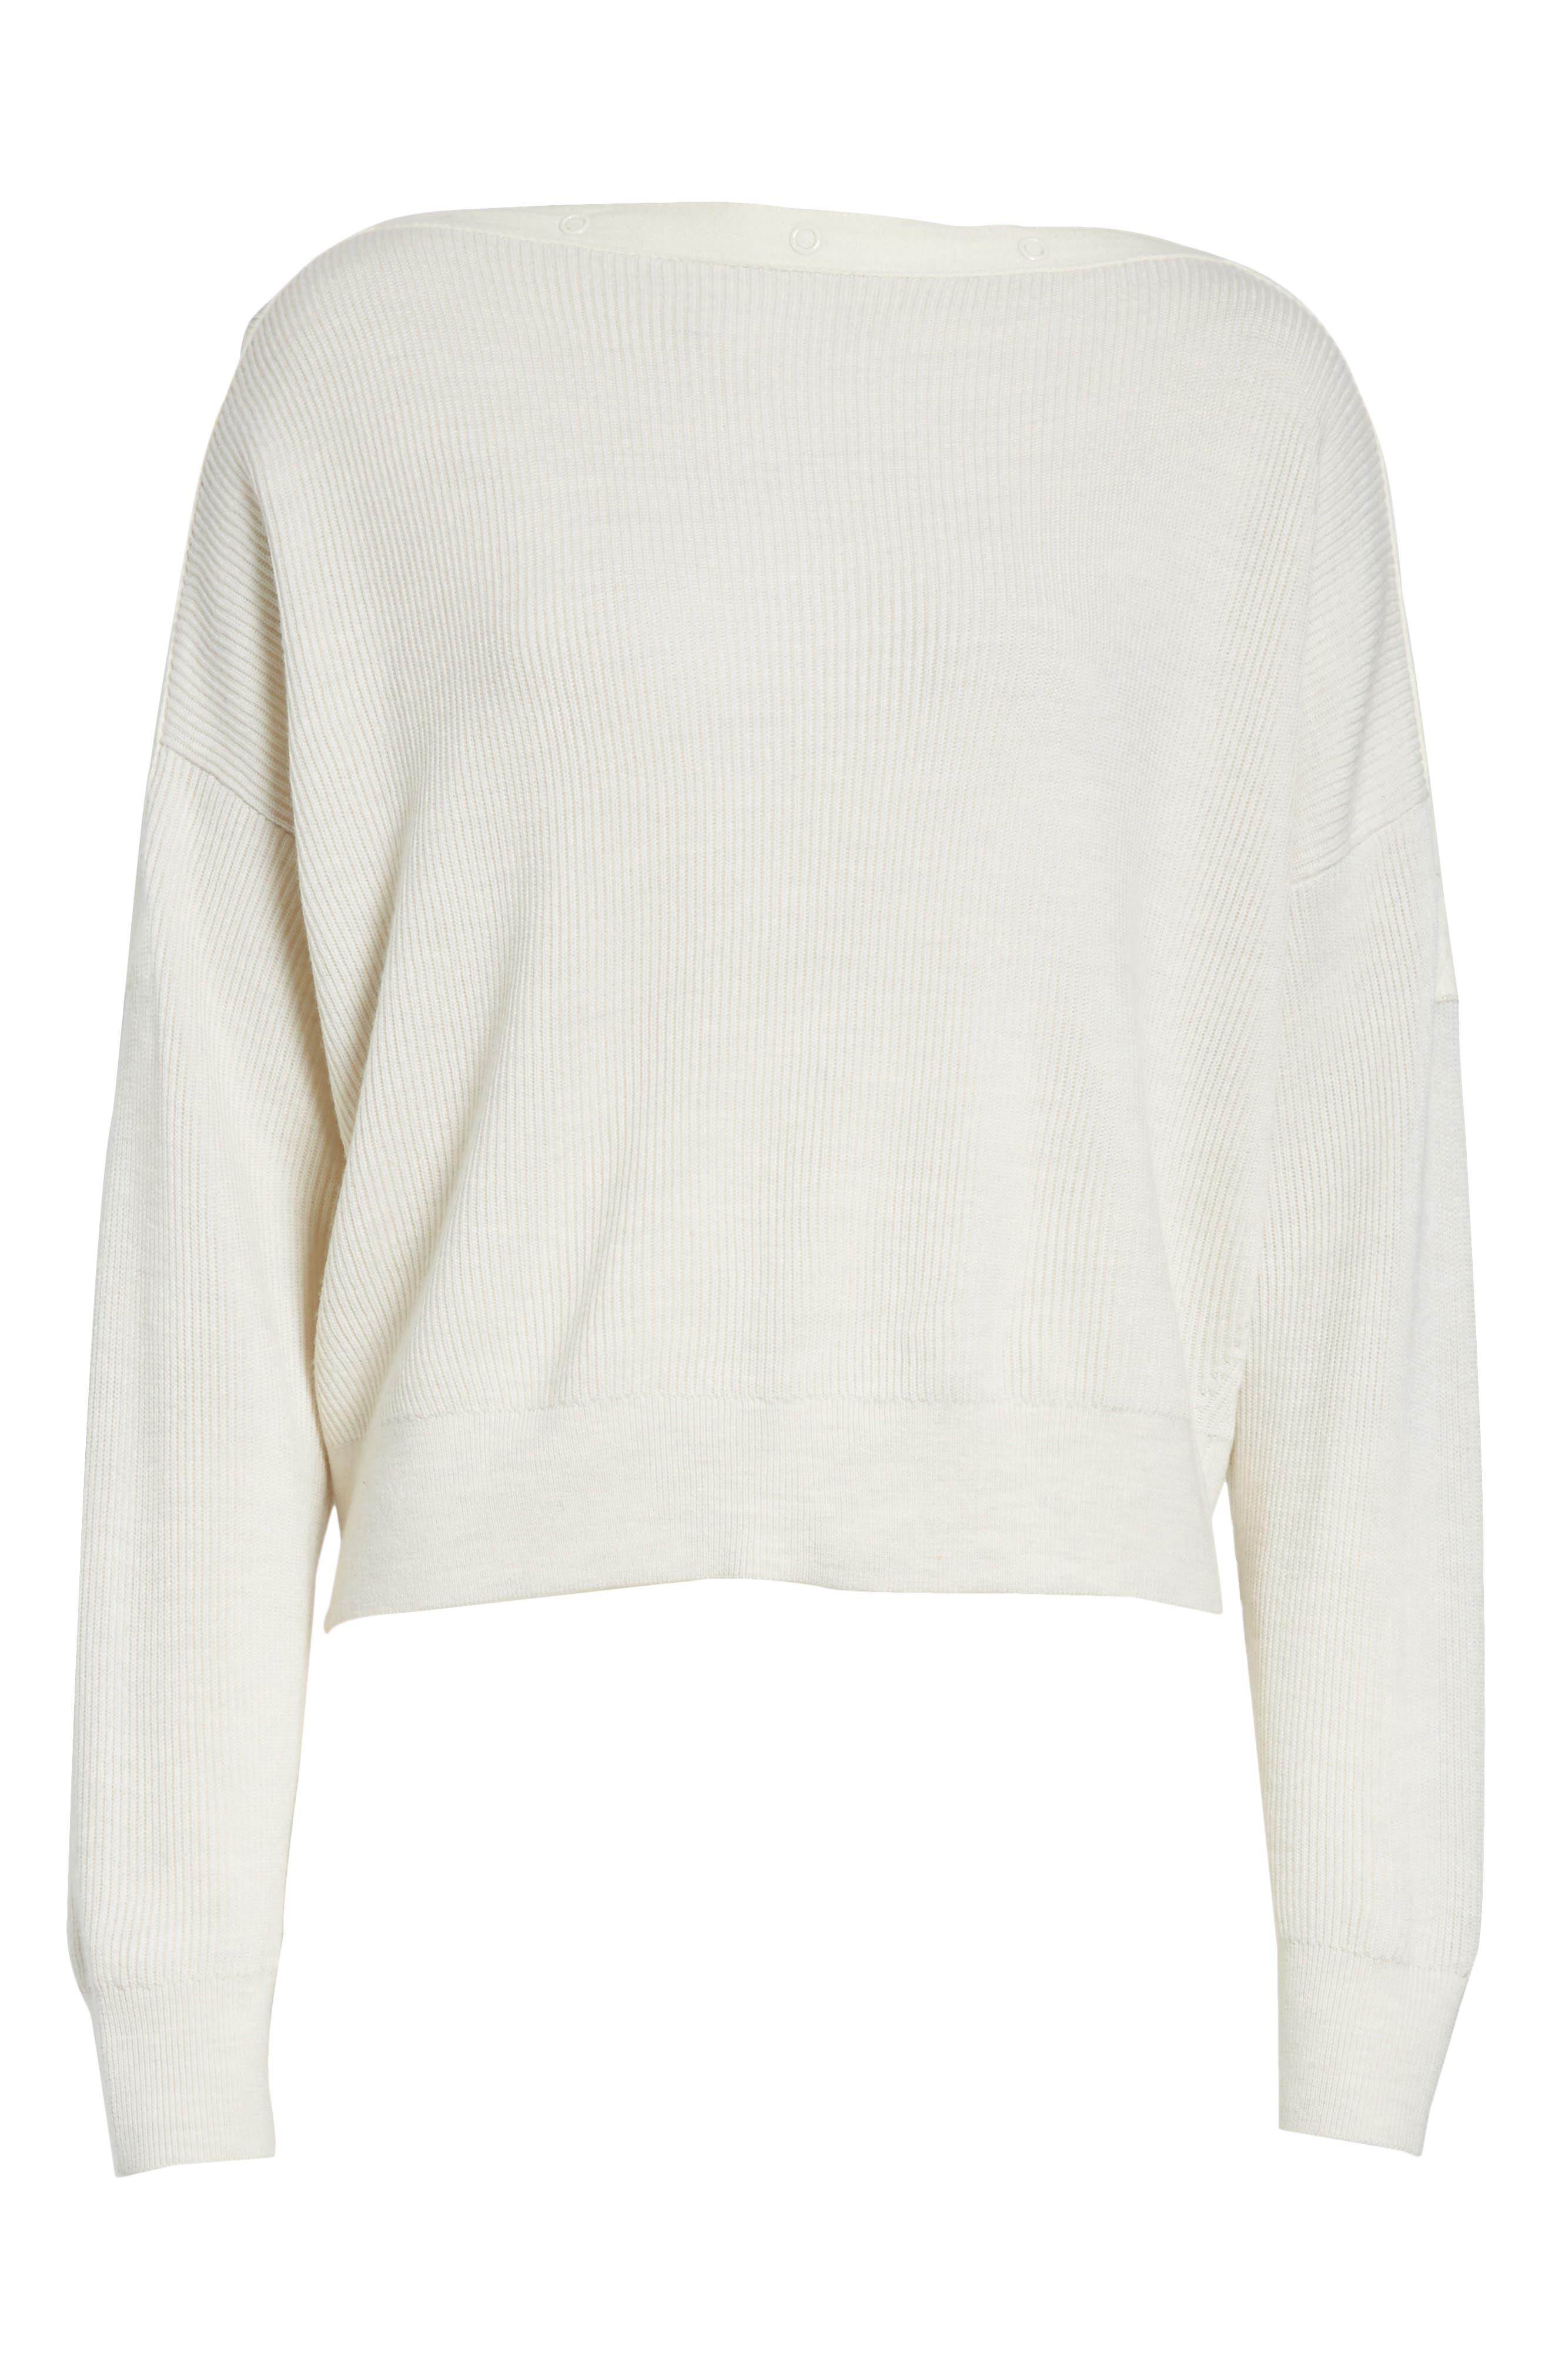 T by Alexander Wang Snap Detail Merino Wool Blend Sweater,                             Alternate thumbnail 6, color,                             906